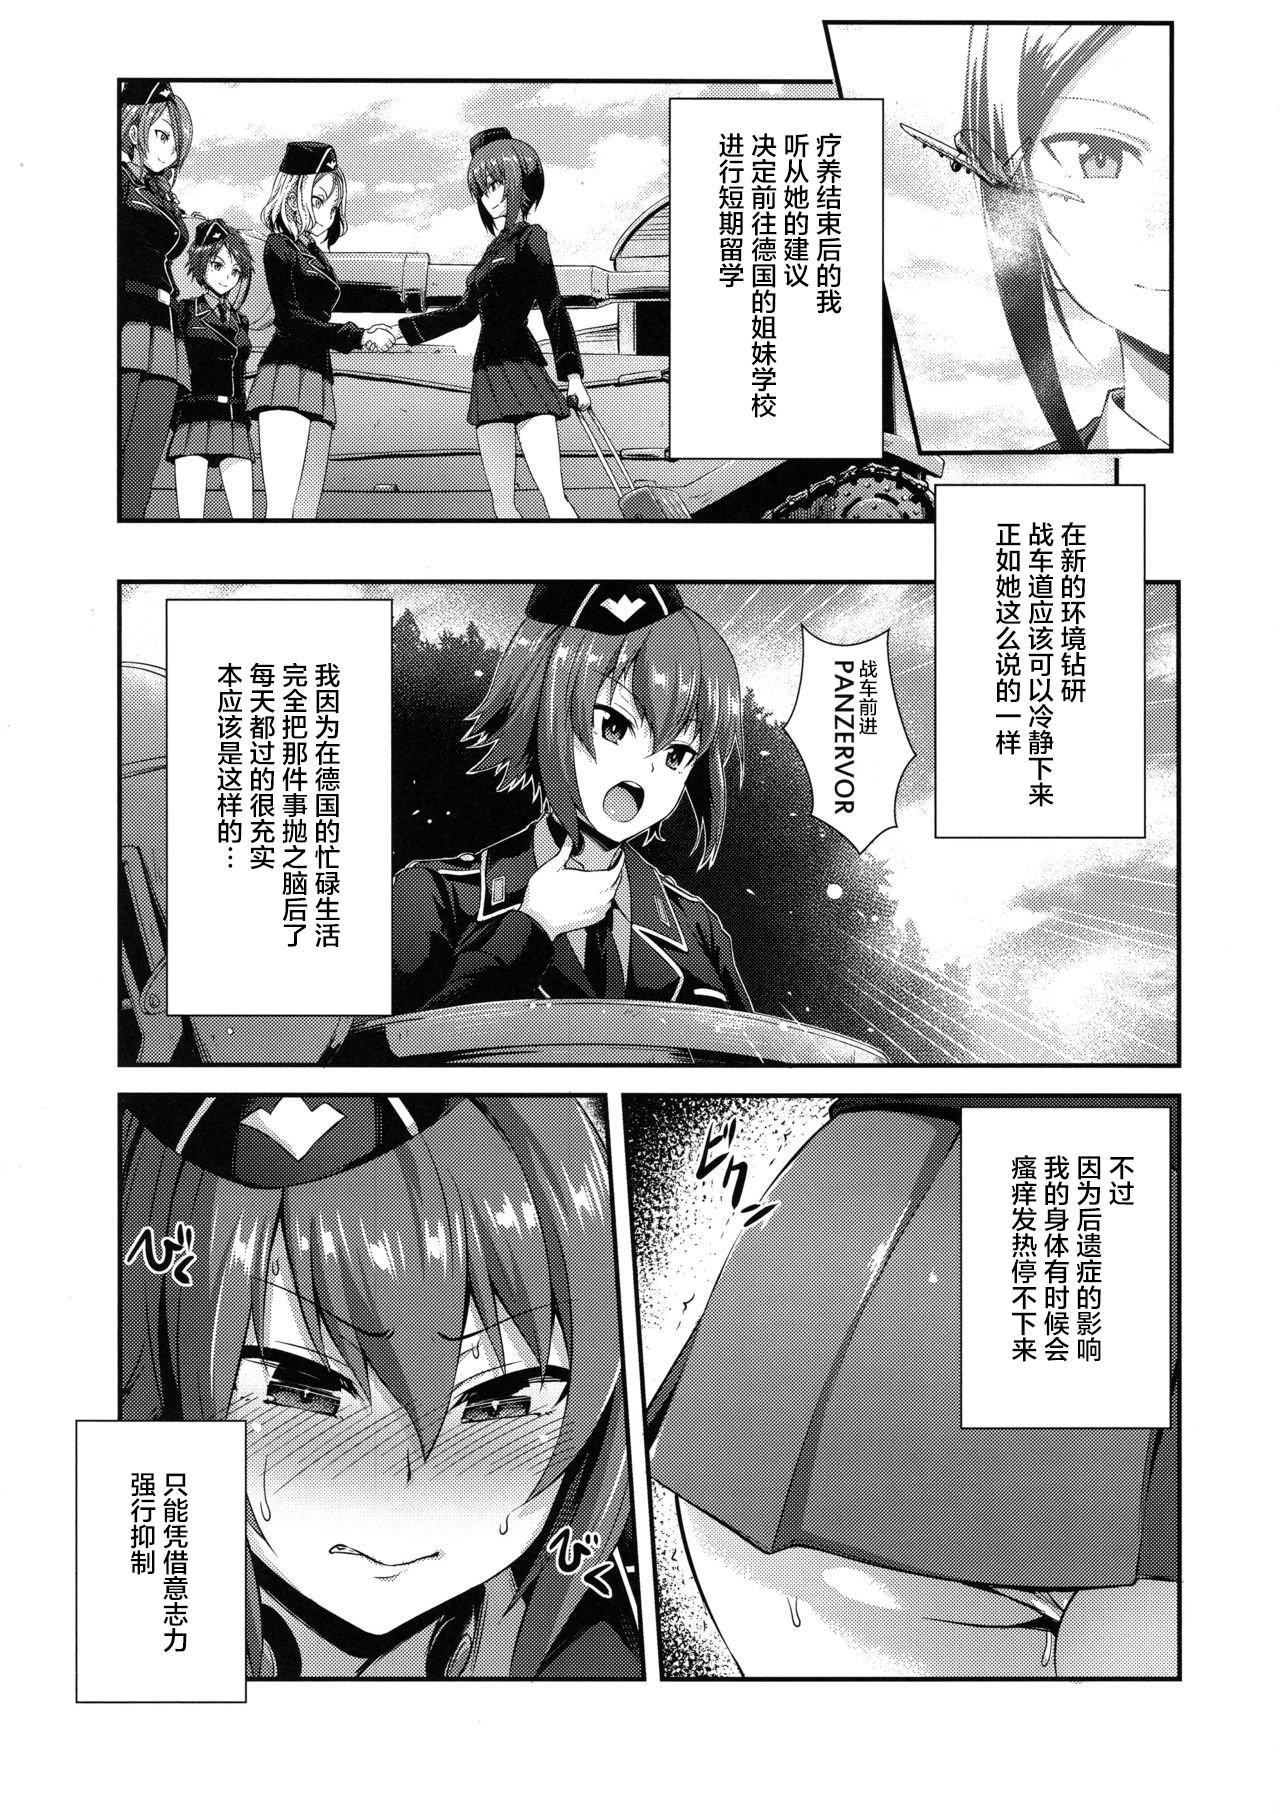 (C94) [chested (Tokupyon)] Nishizumi-ryuu Iemoto no Sodatekata - Maho no Baai Jou (Girls und Panzer) [Chinese] [不咕鸟汉化组] 6